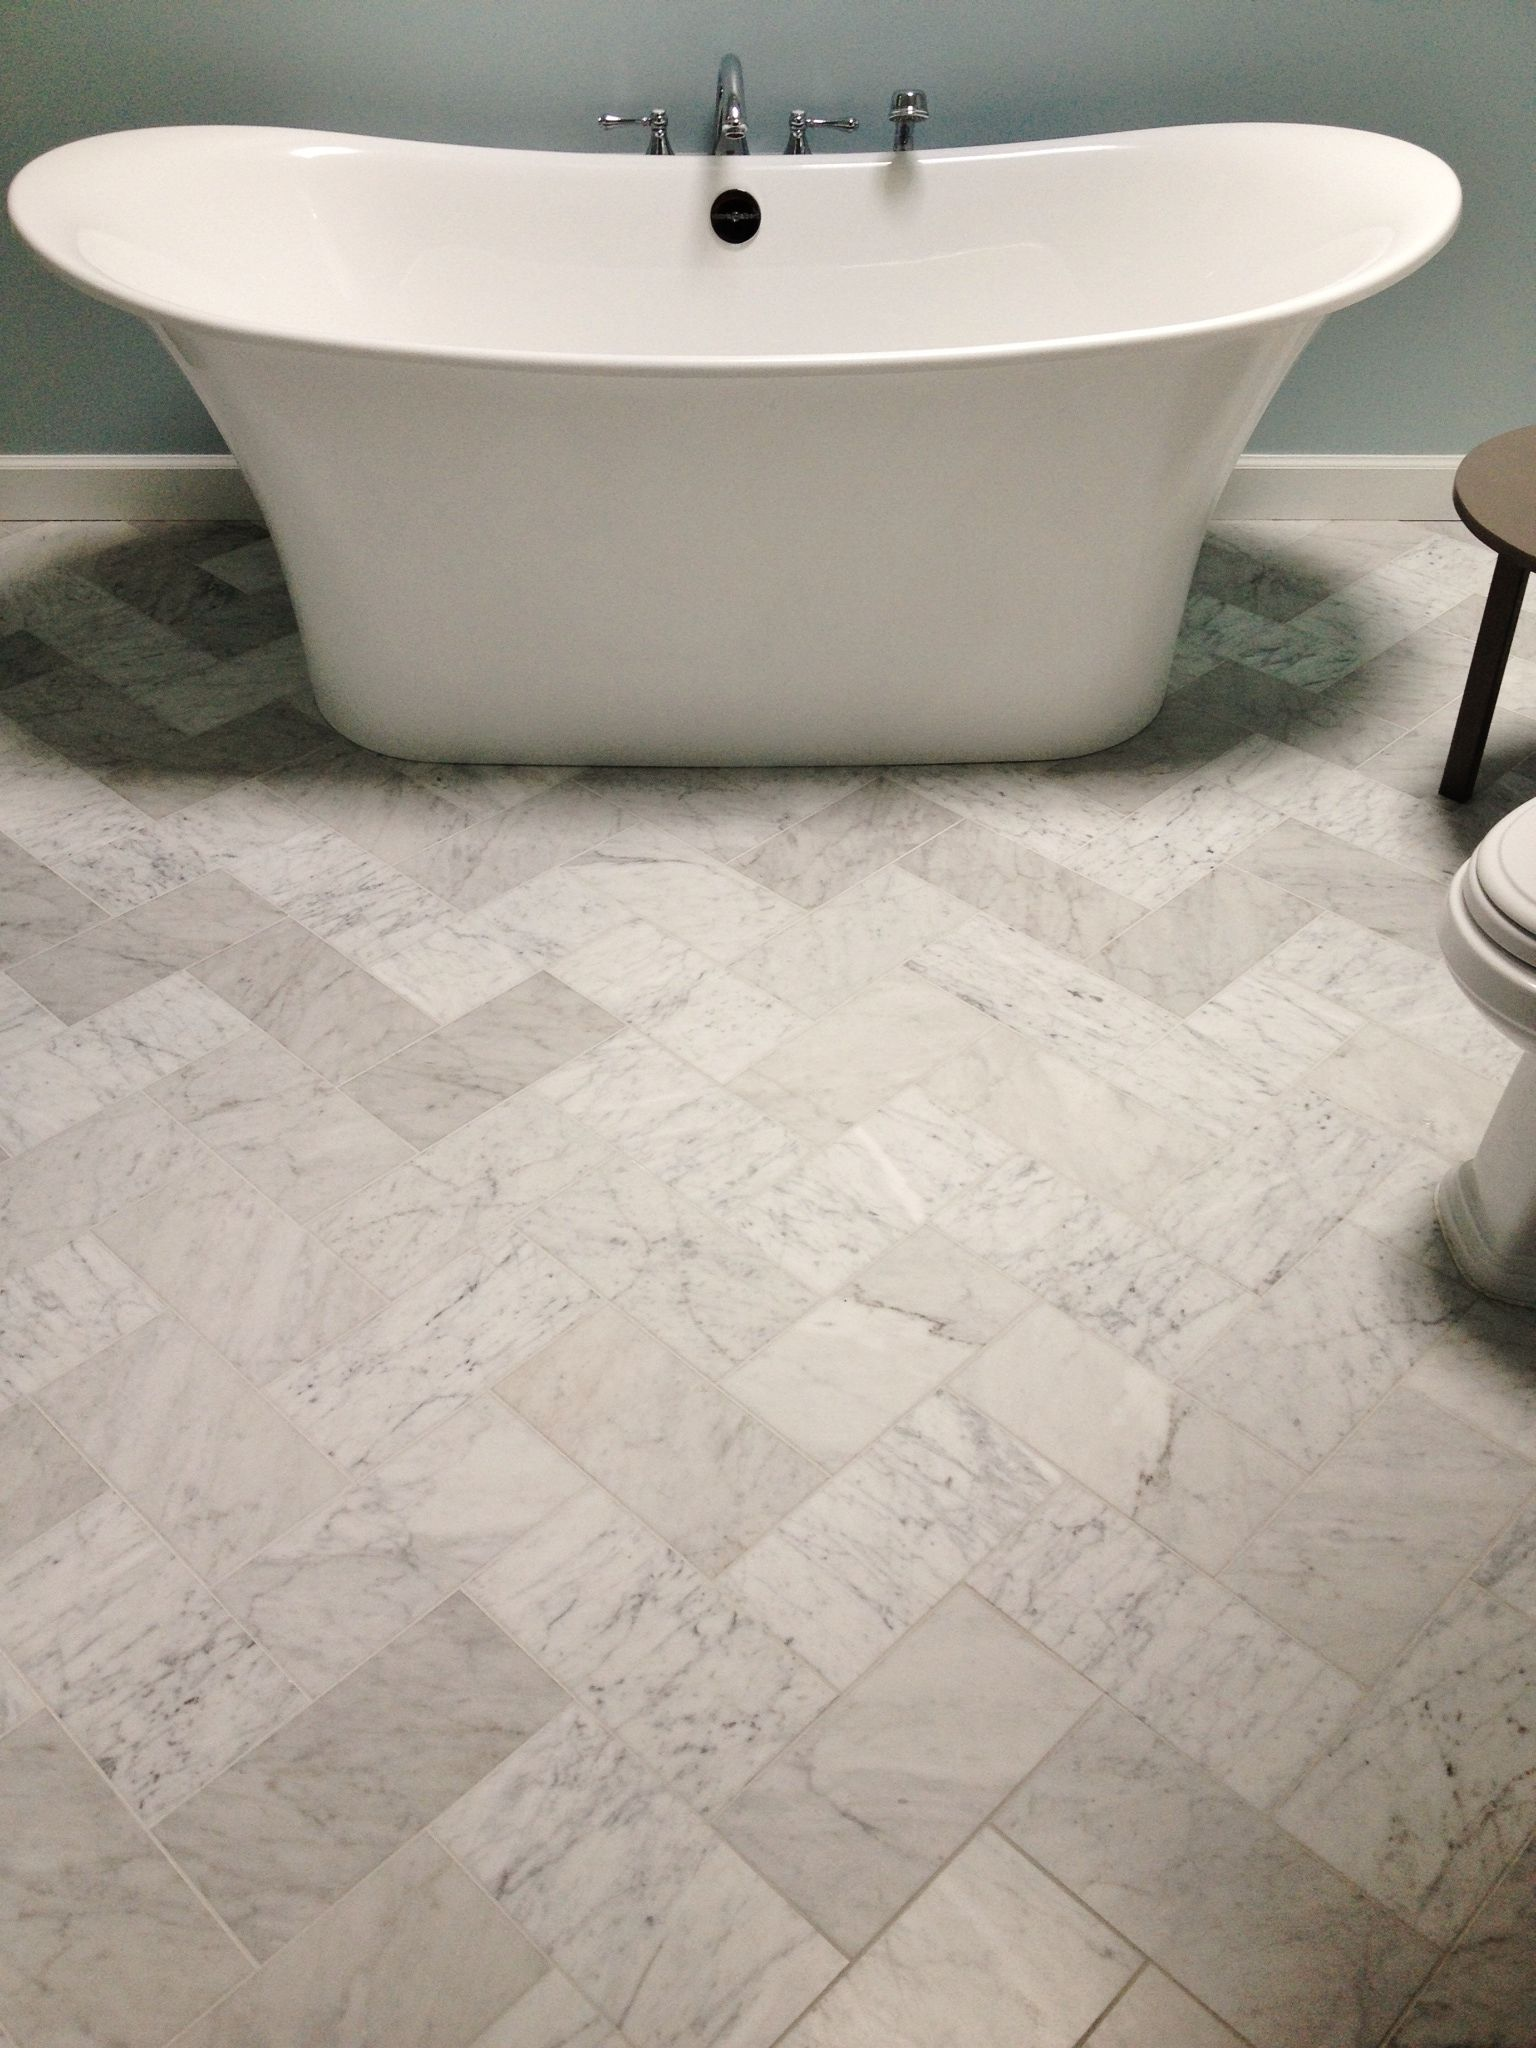 6x12 Venetino marble tiles set in the herringbone pattern on this